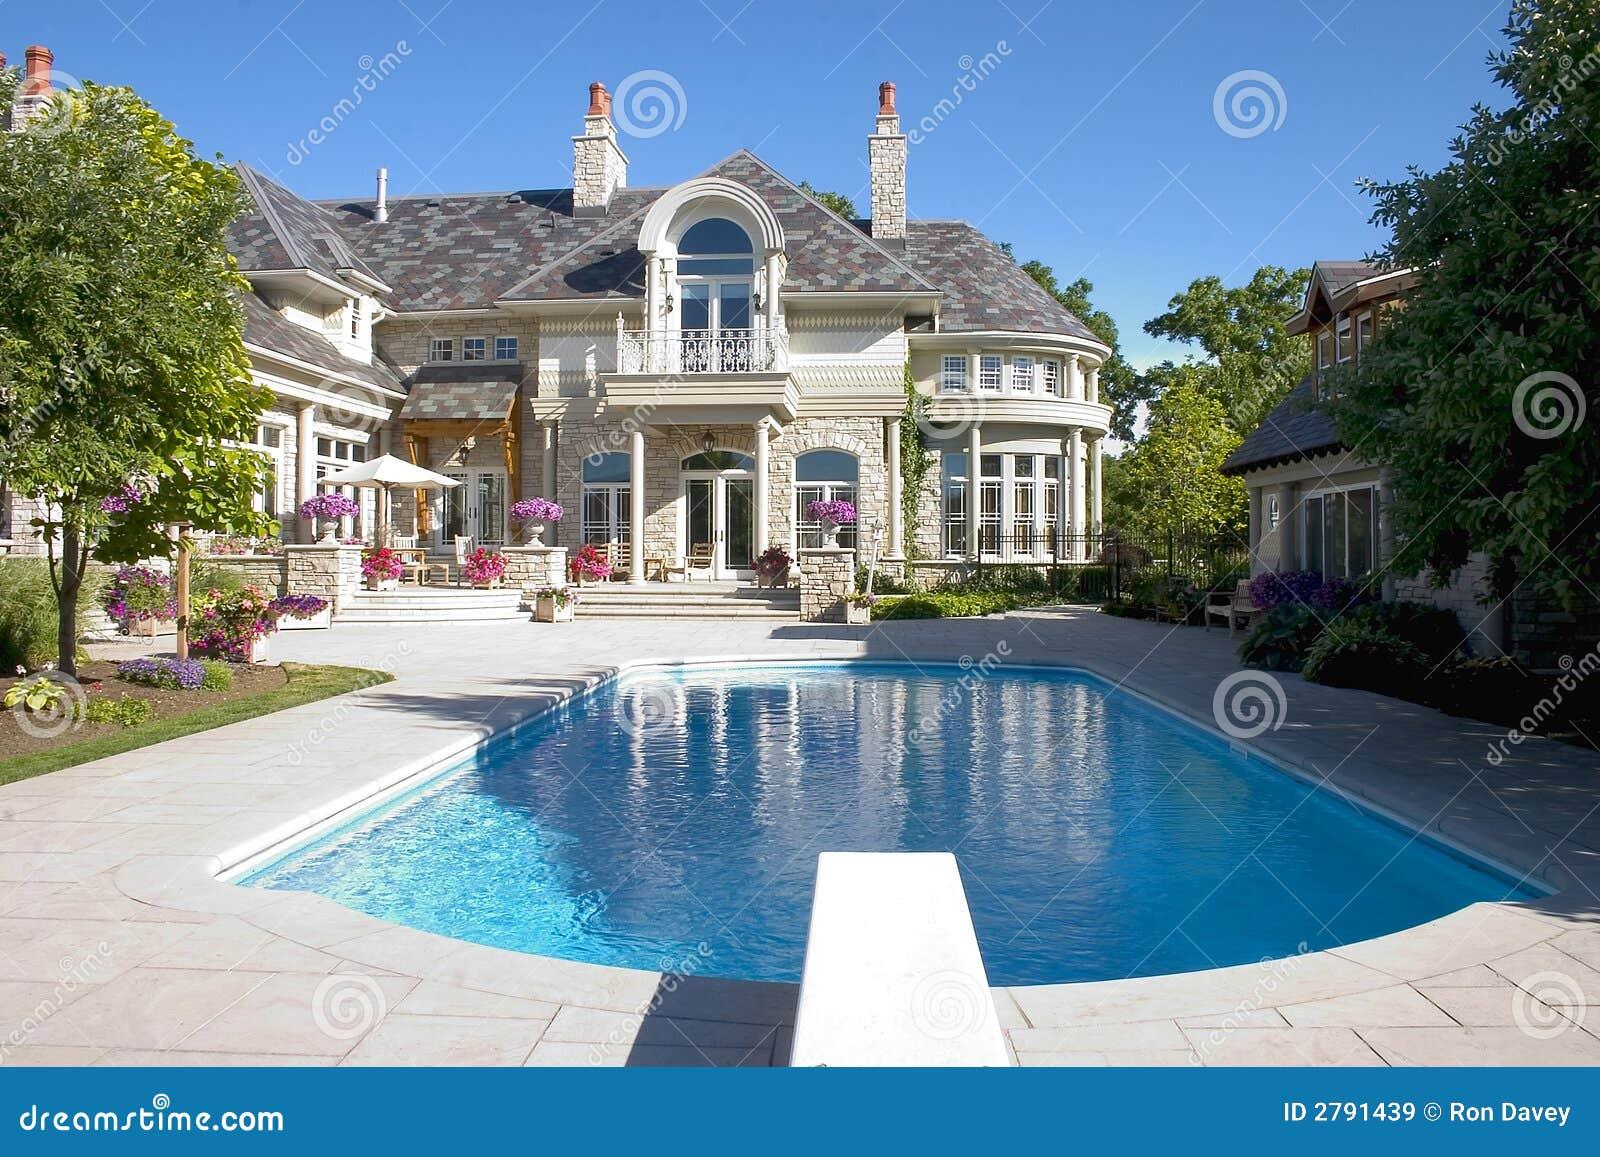 10 Bedroom Villa Florida